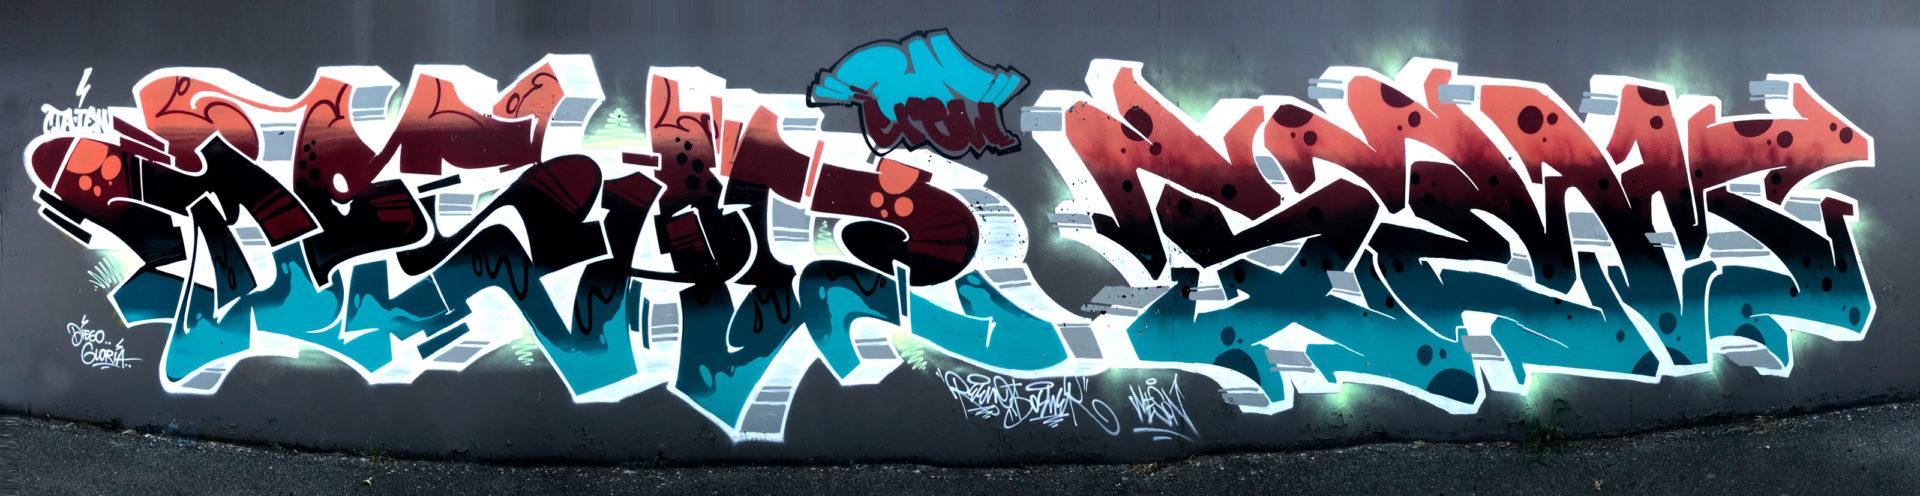 Reeno Dosher + Meson